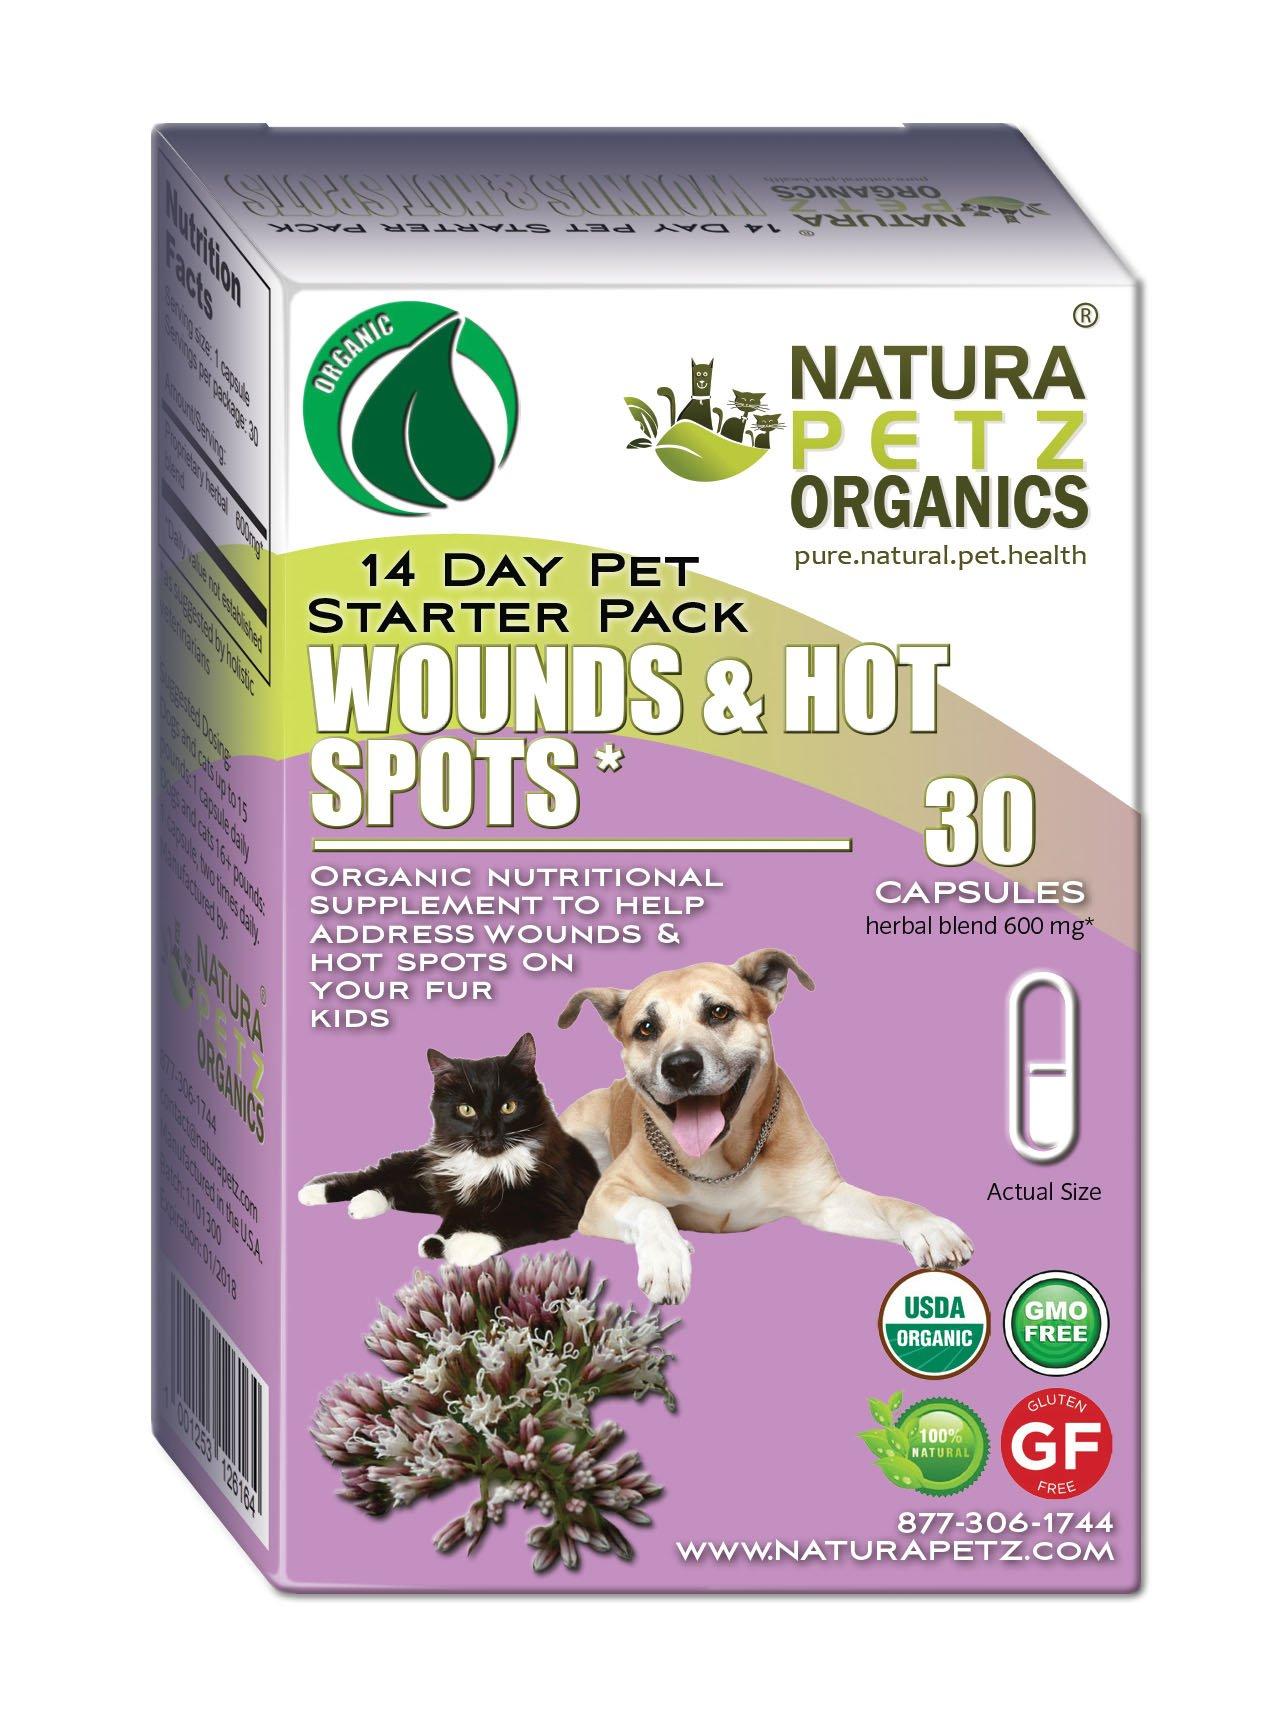 Natura Petz Organics Wound and Hot Spot Starter Pack for Dogs and Cats by Natura Petz Organics